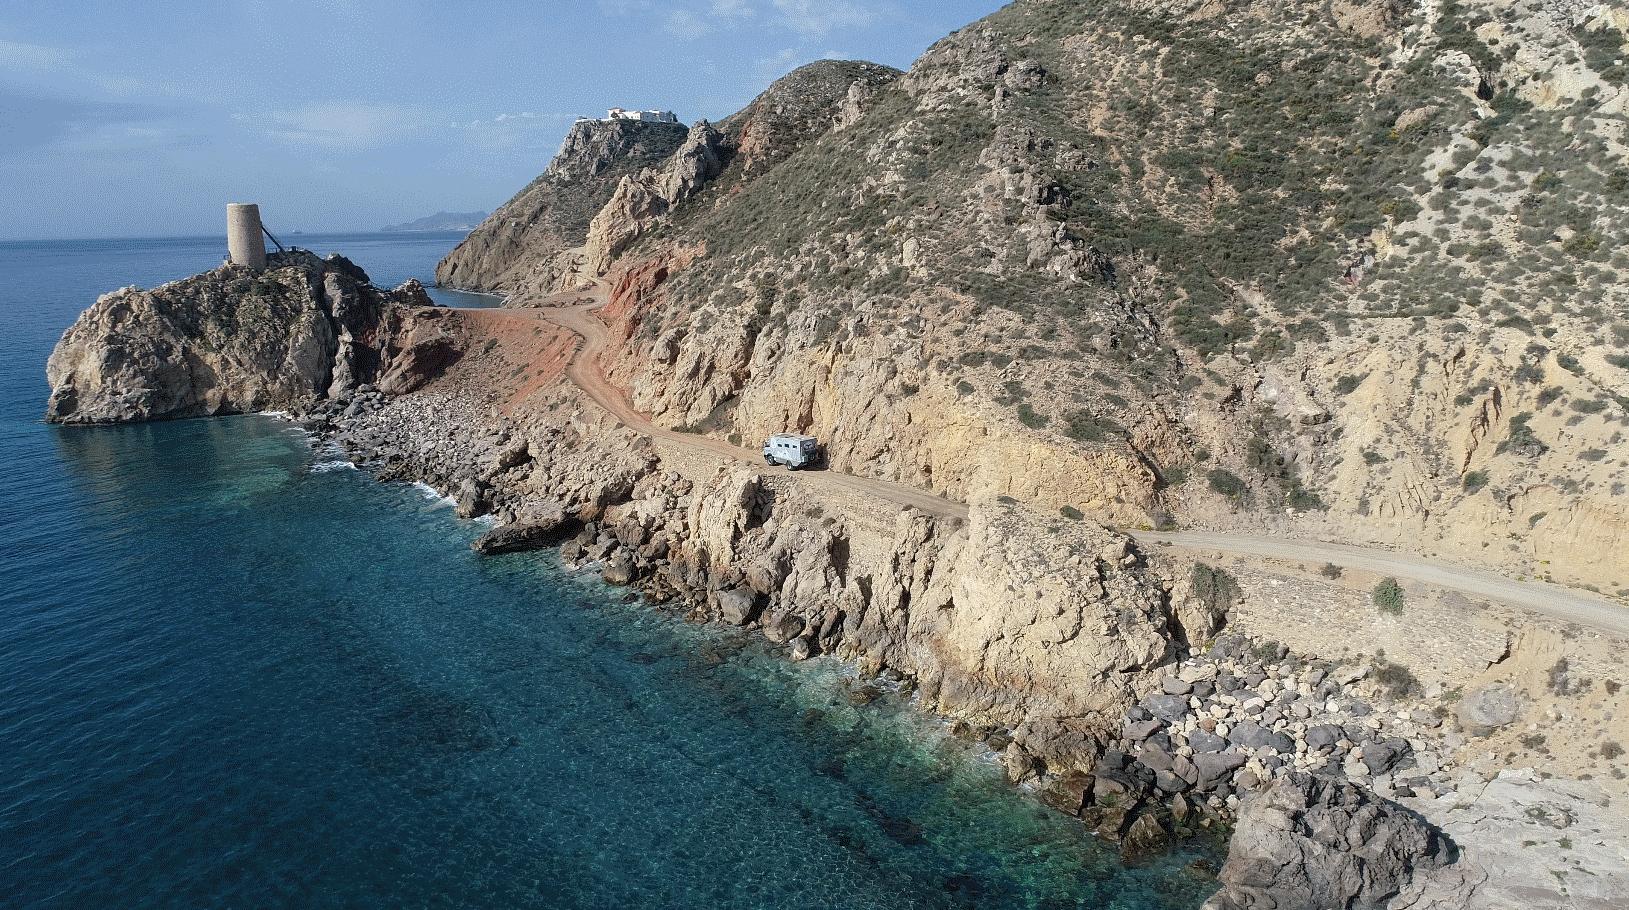 Küstentrail Whaly